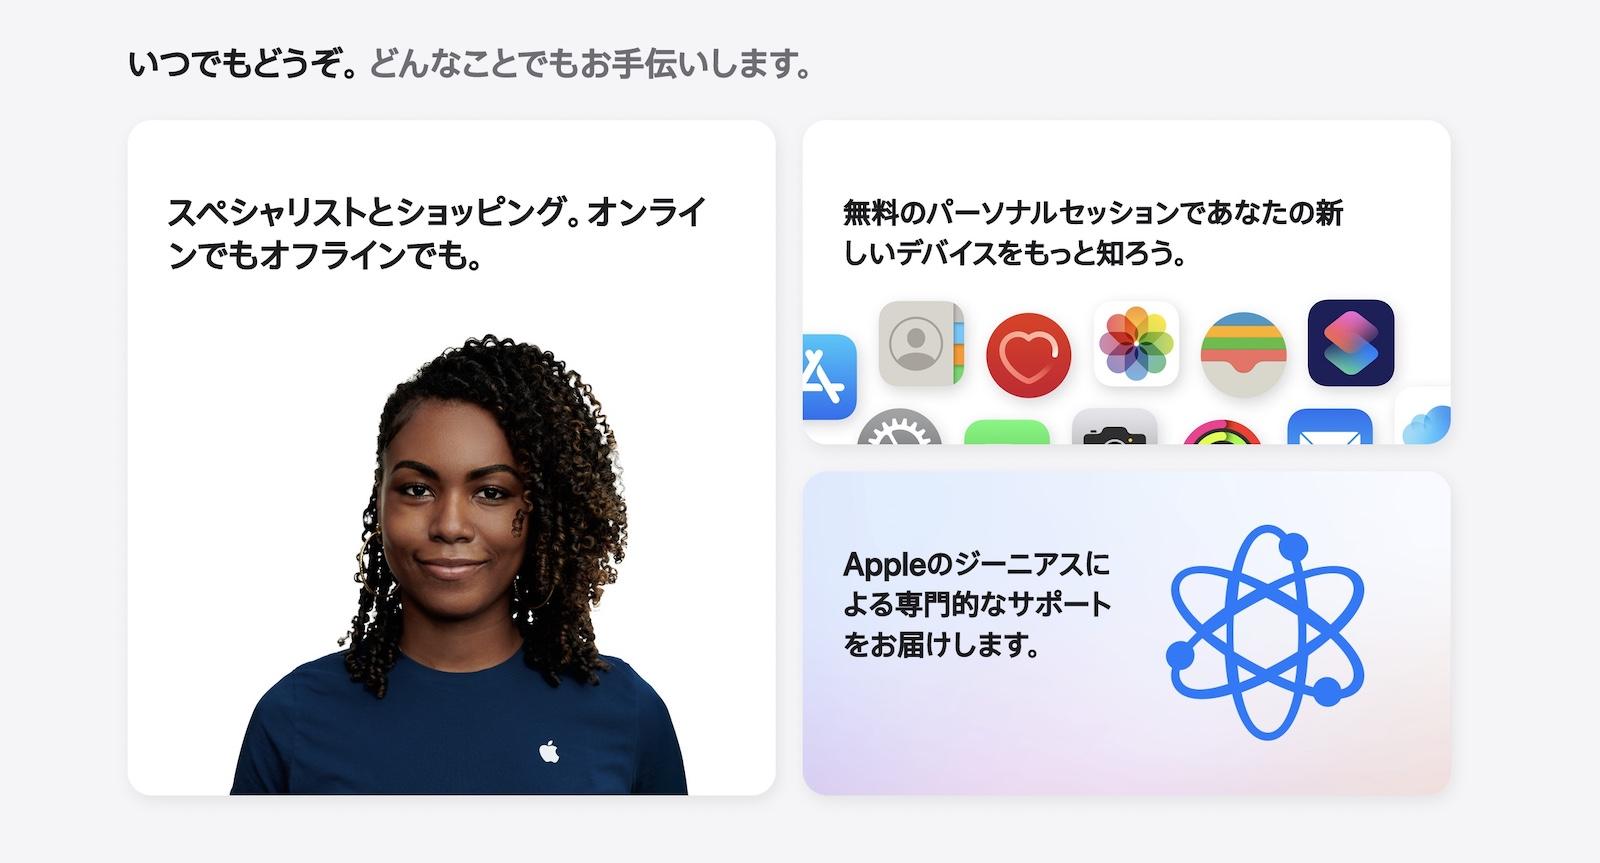 Apple Store for beginners